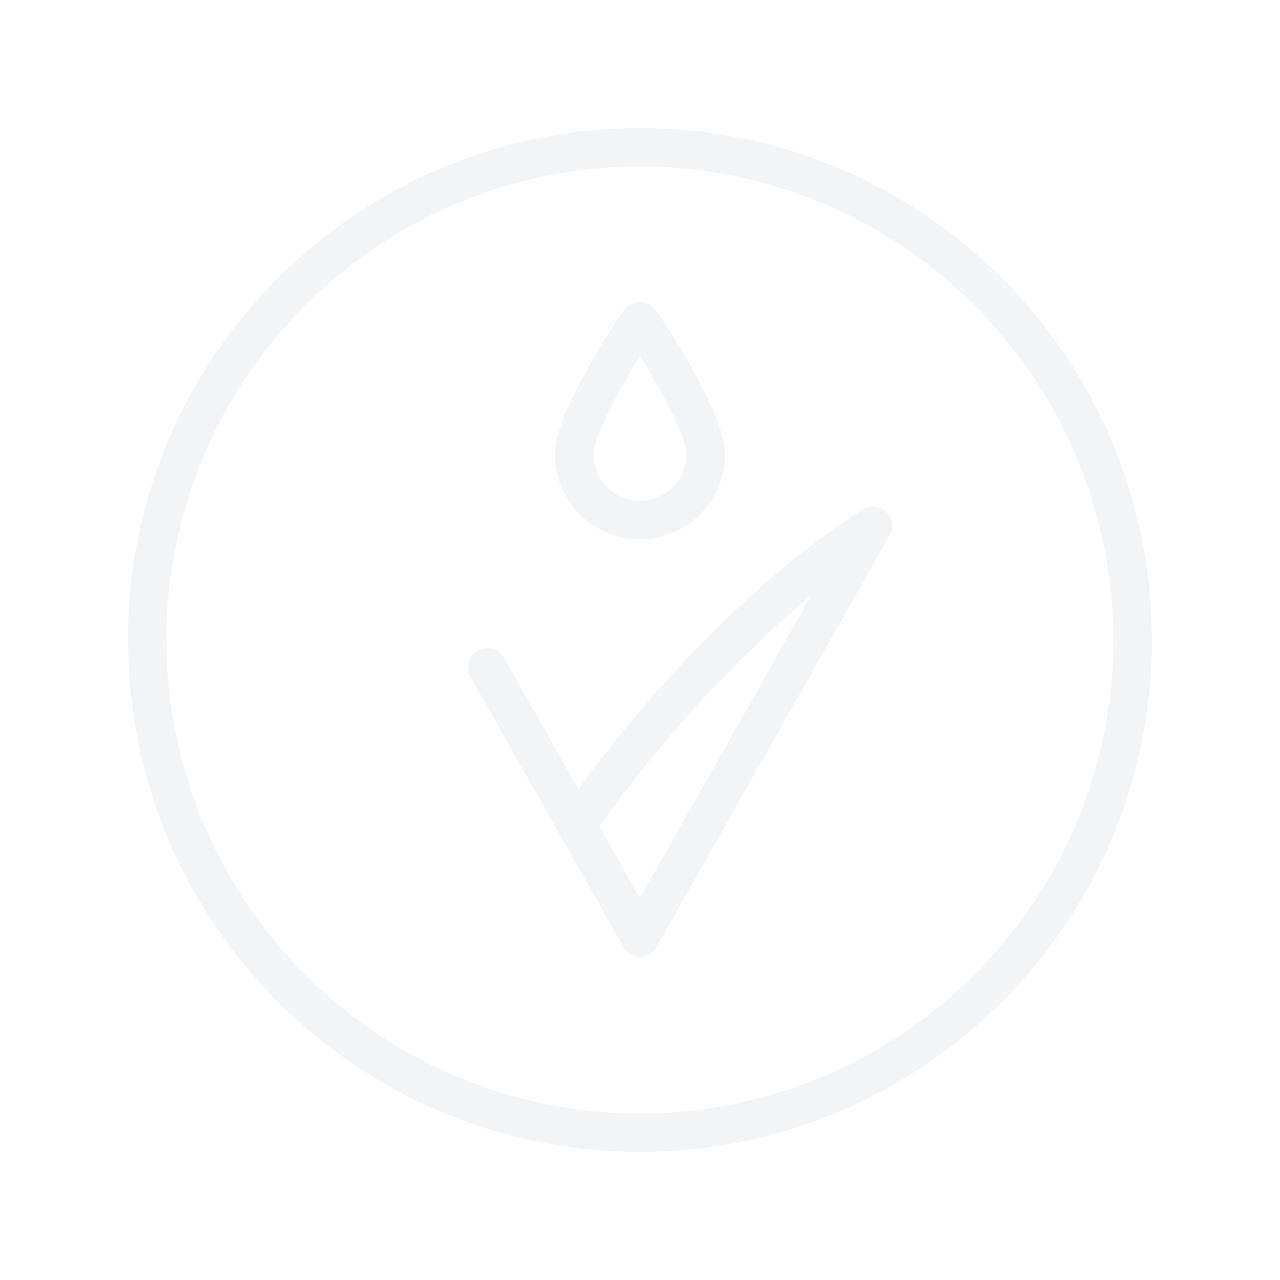 MADARA Regene Collection Gift Set